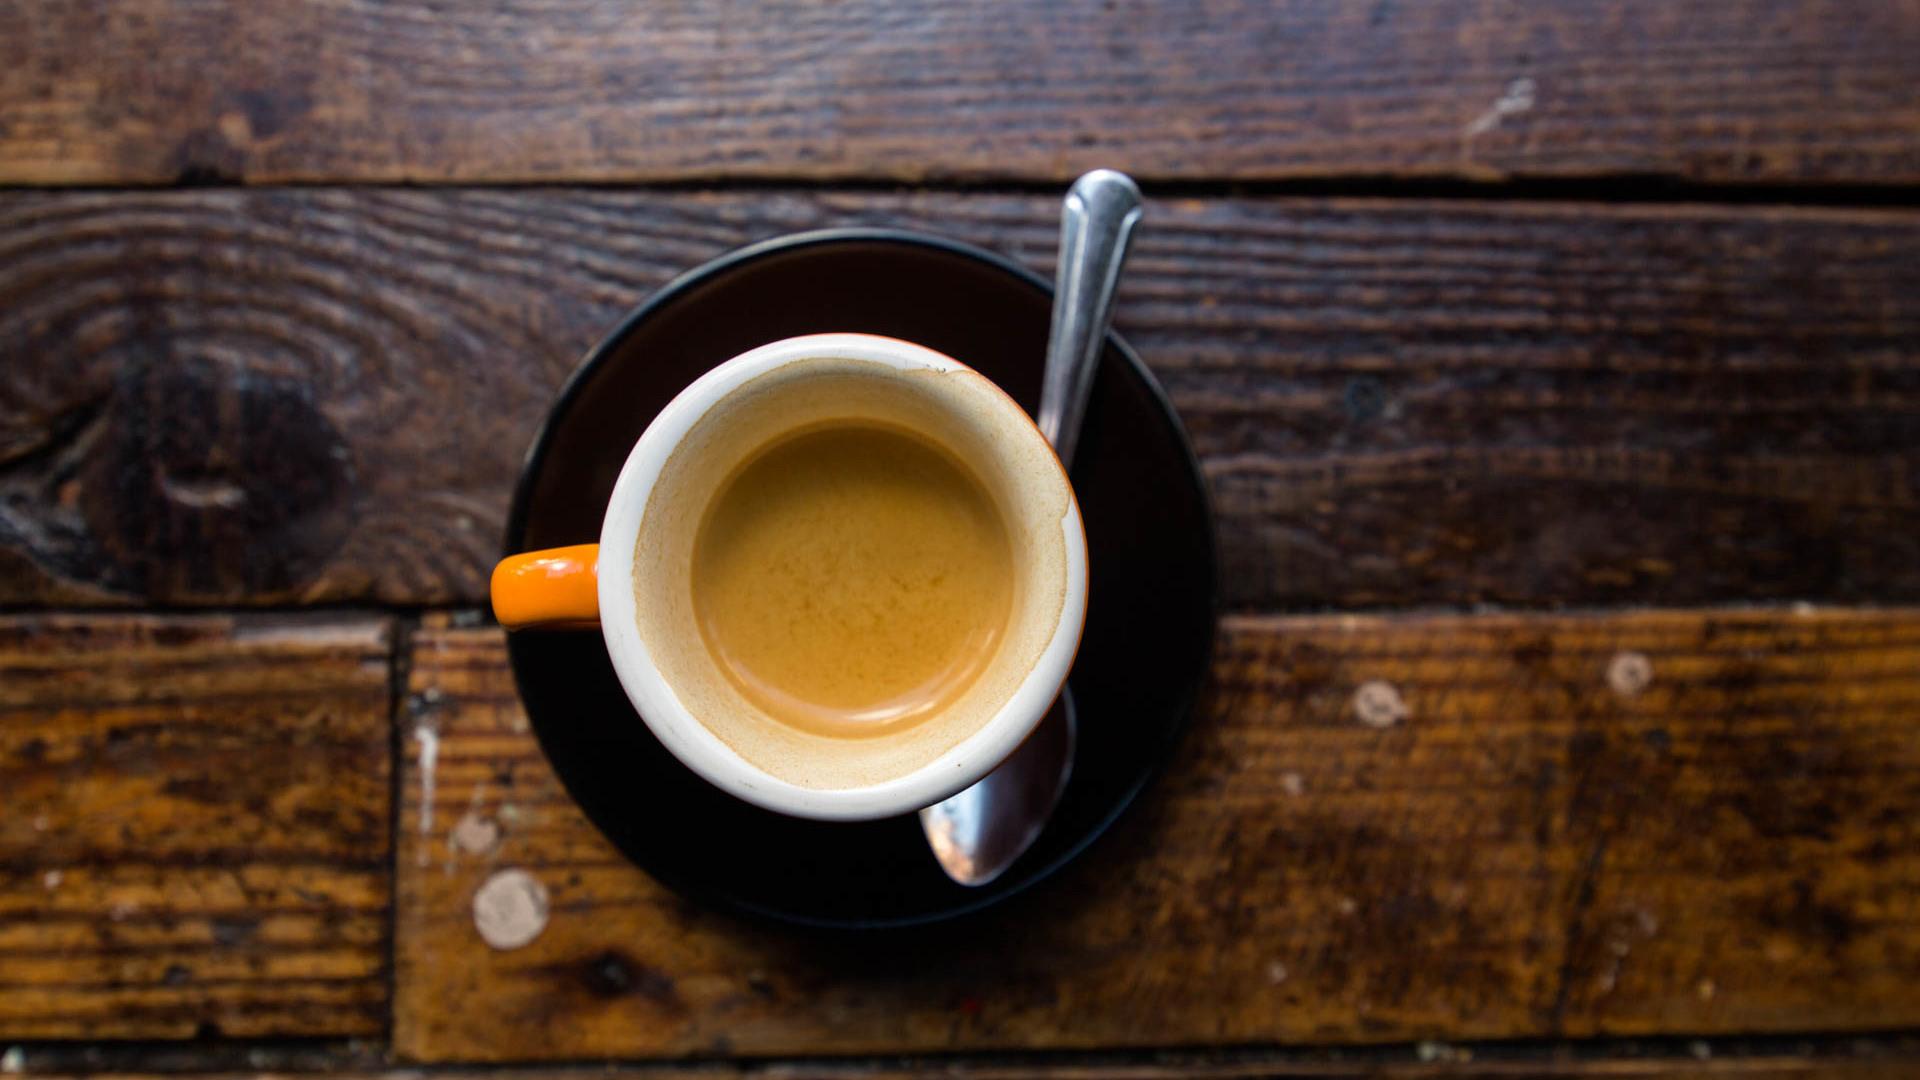 Cafe grumpy chelsea 4